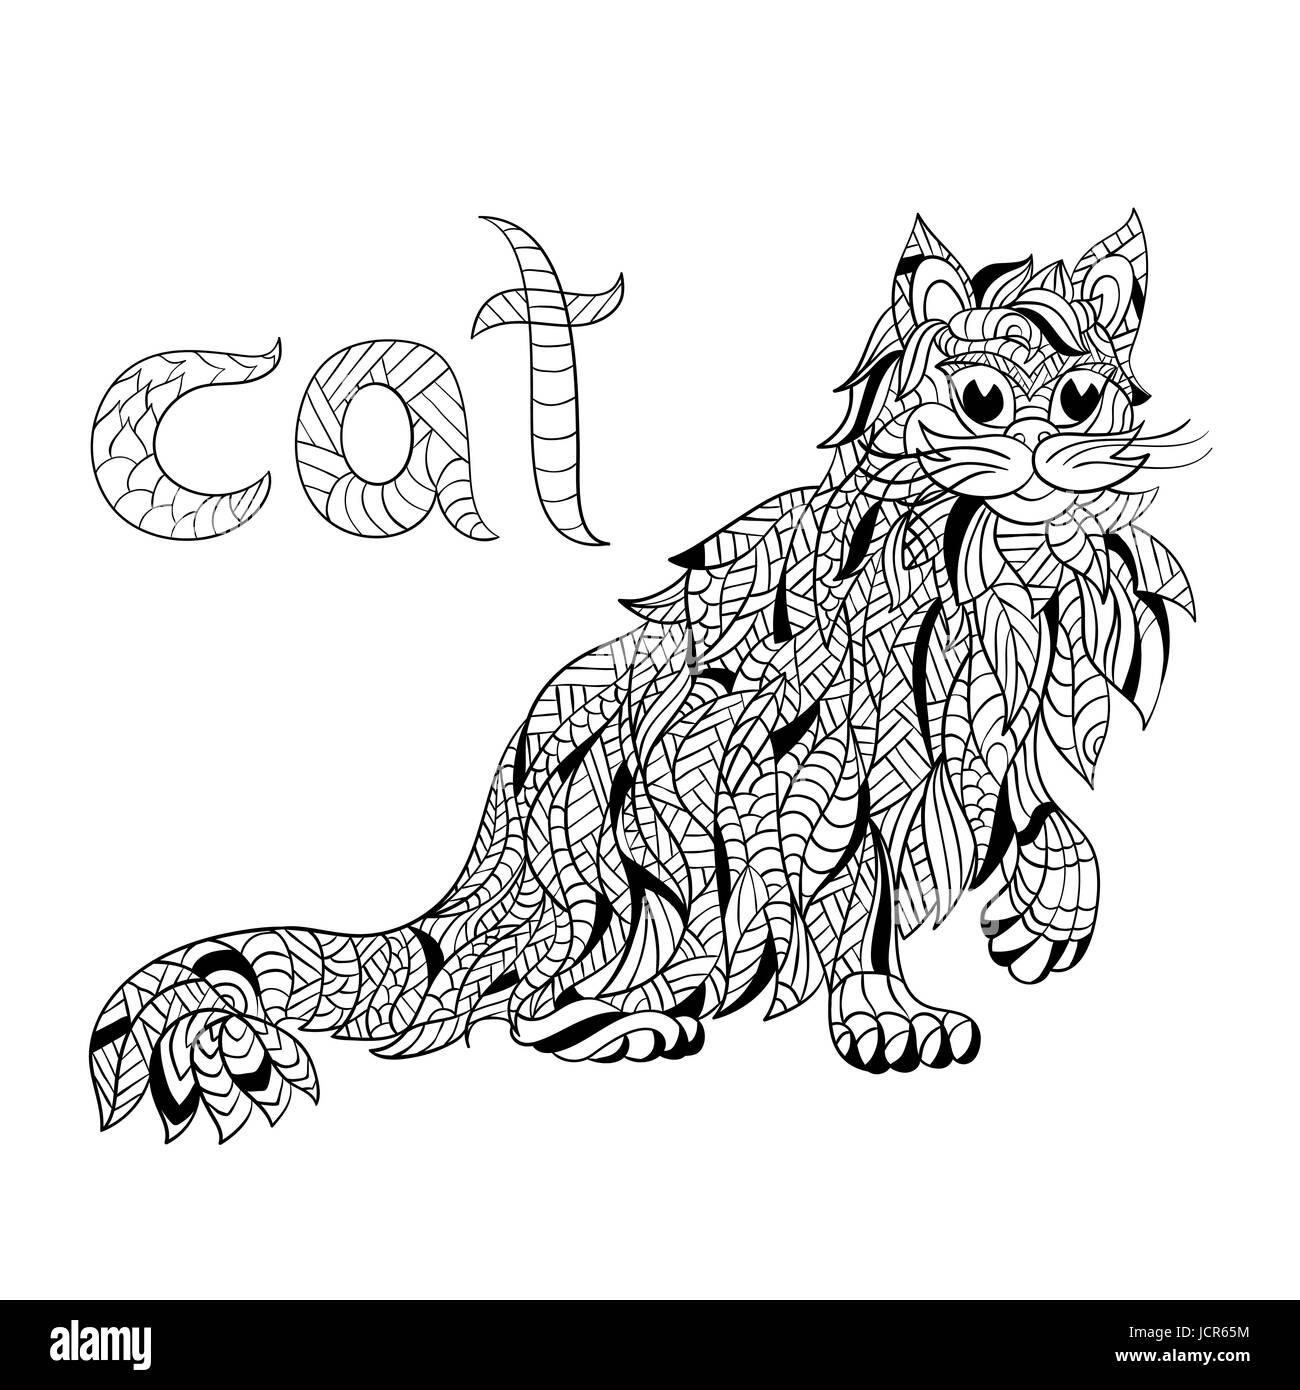 Sitting Cat Hand Drawn Illustration Stockfotos & Sitting Cat Hand ...